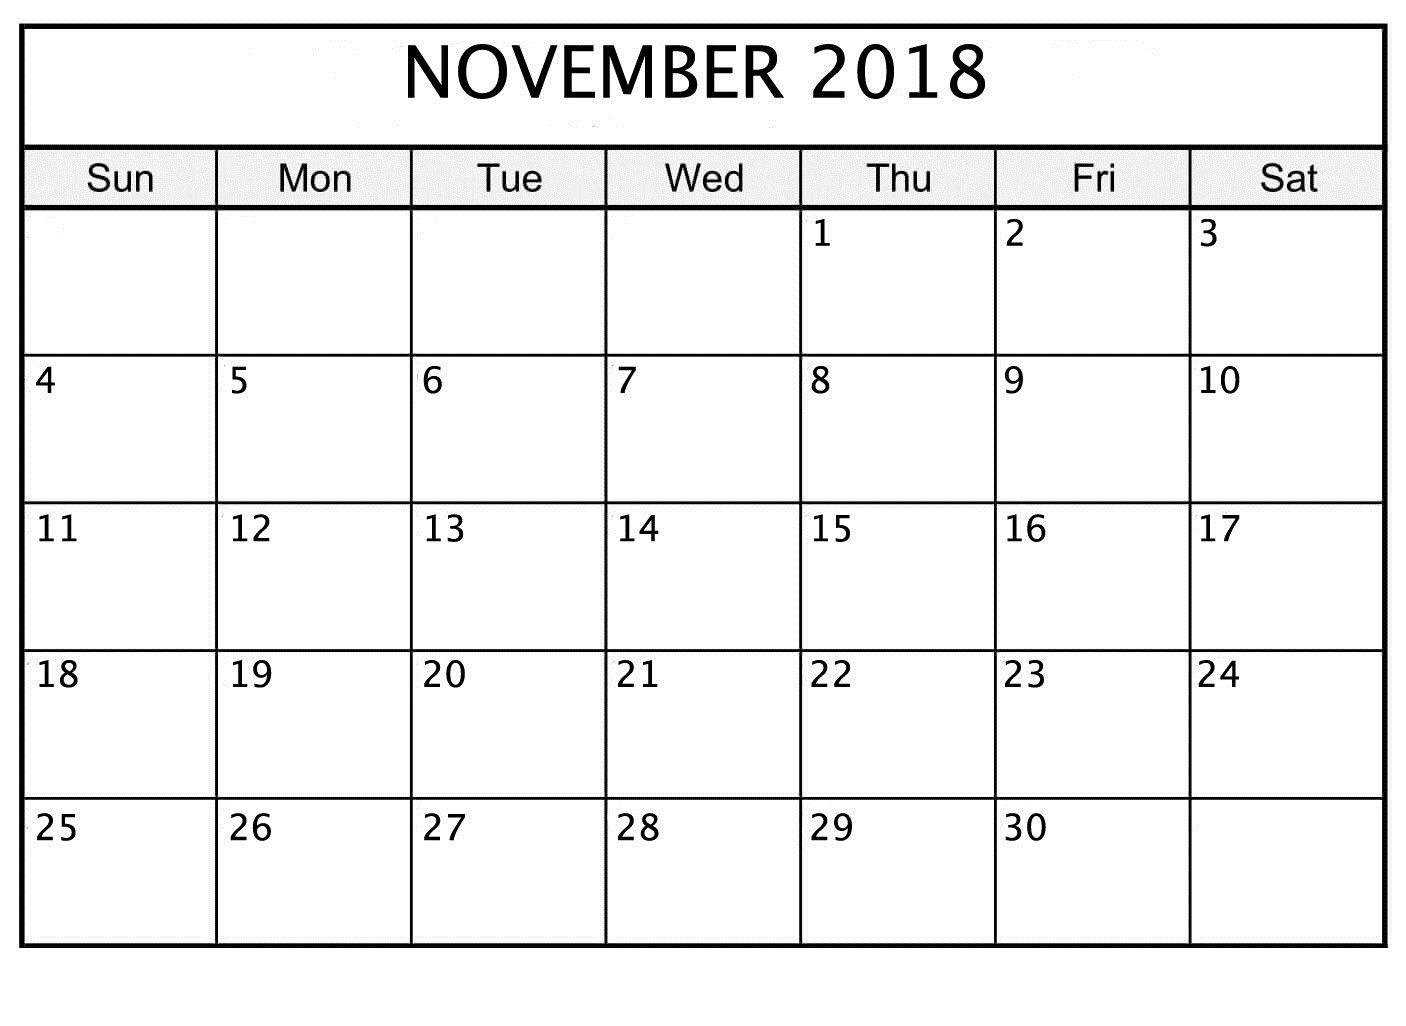 November 2018 Printable Calendar Date And Time | November 2018 Calendar Template Date And Time